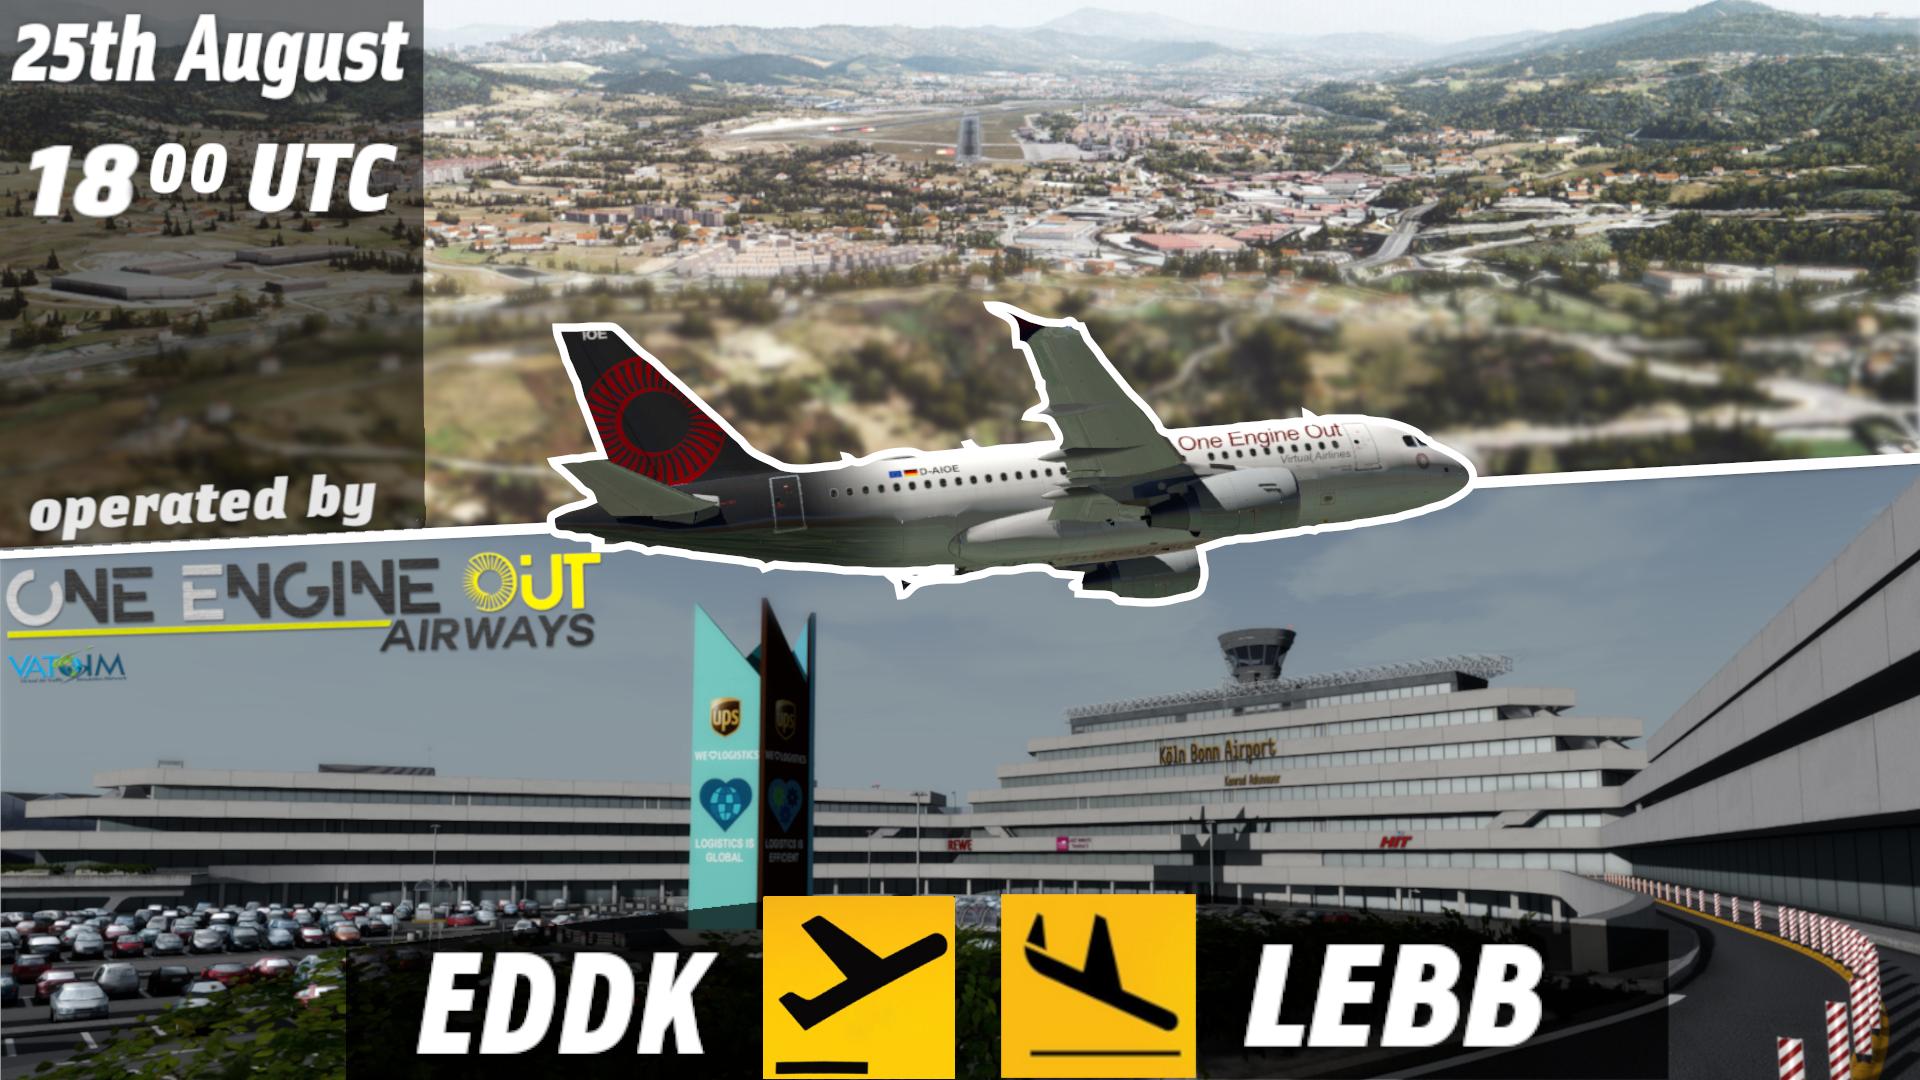 VATSIM EDDK/LEBB Groupflight